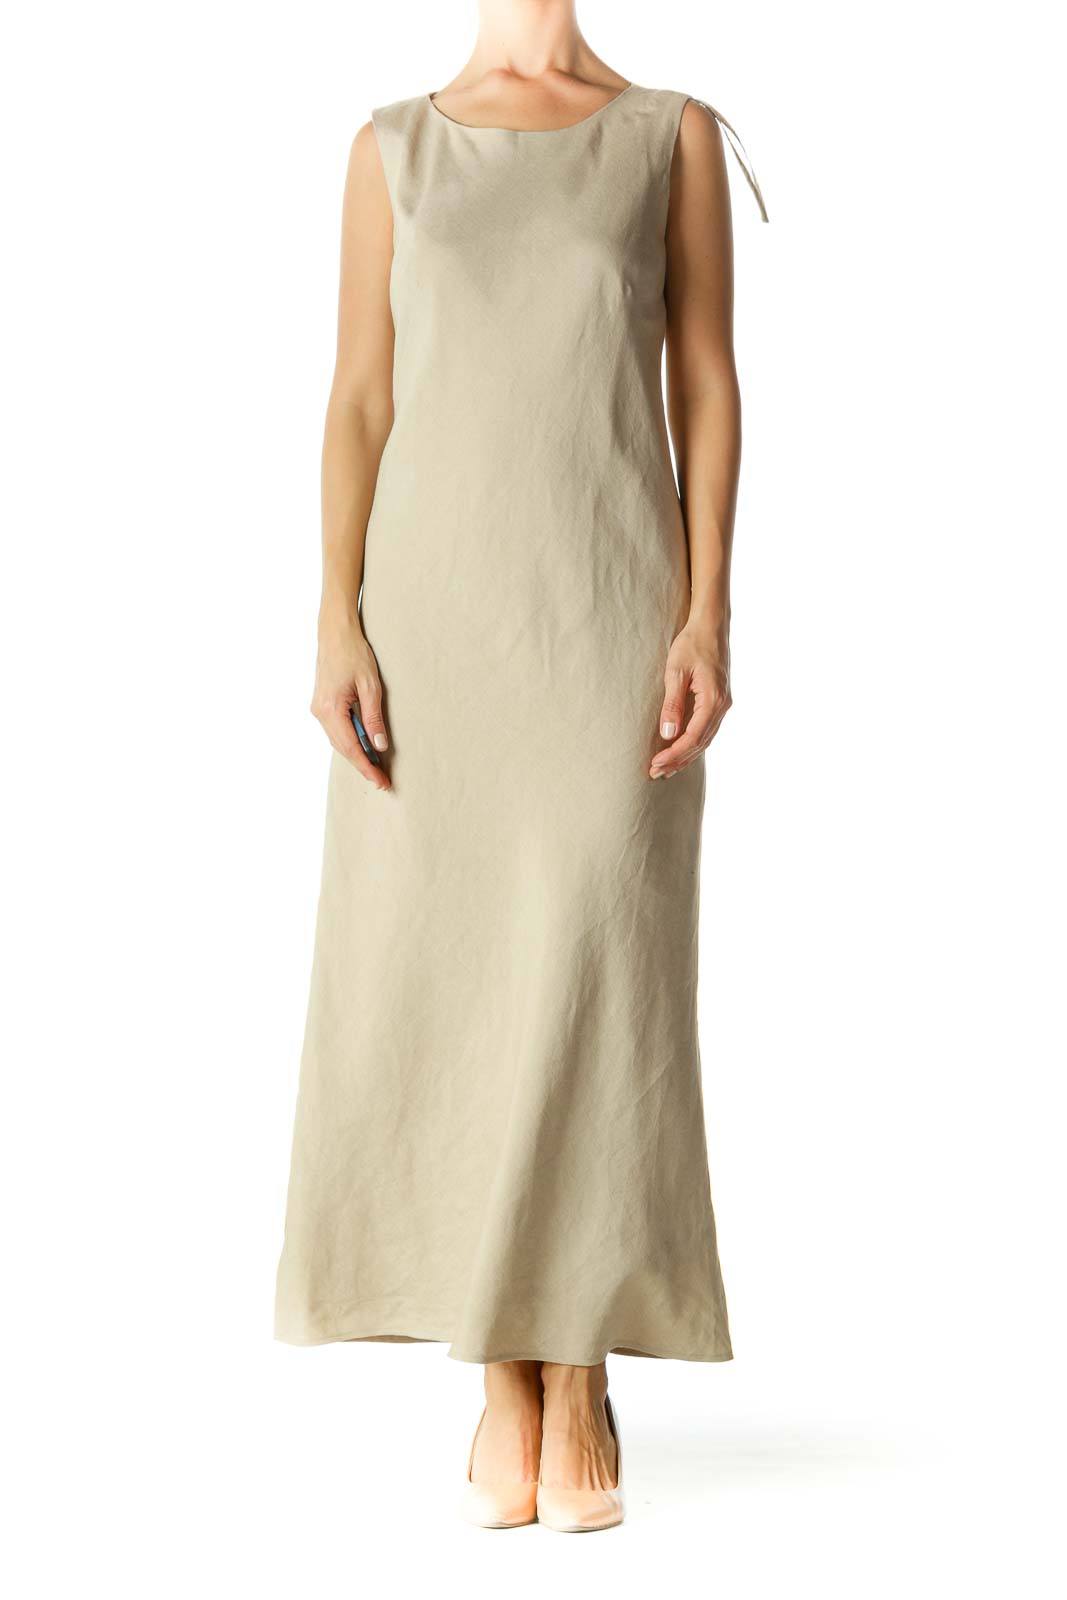 Beige Shift Maxi Dress